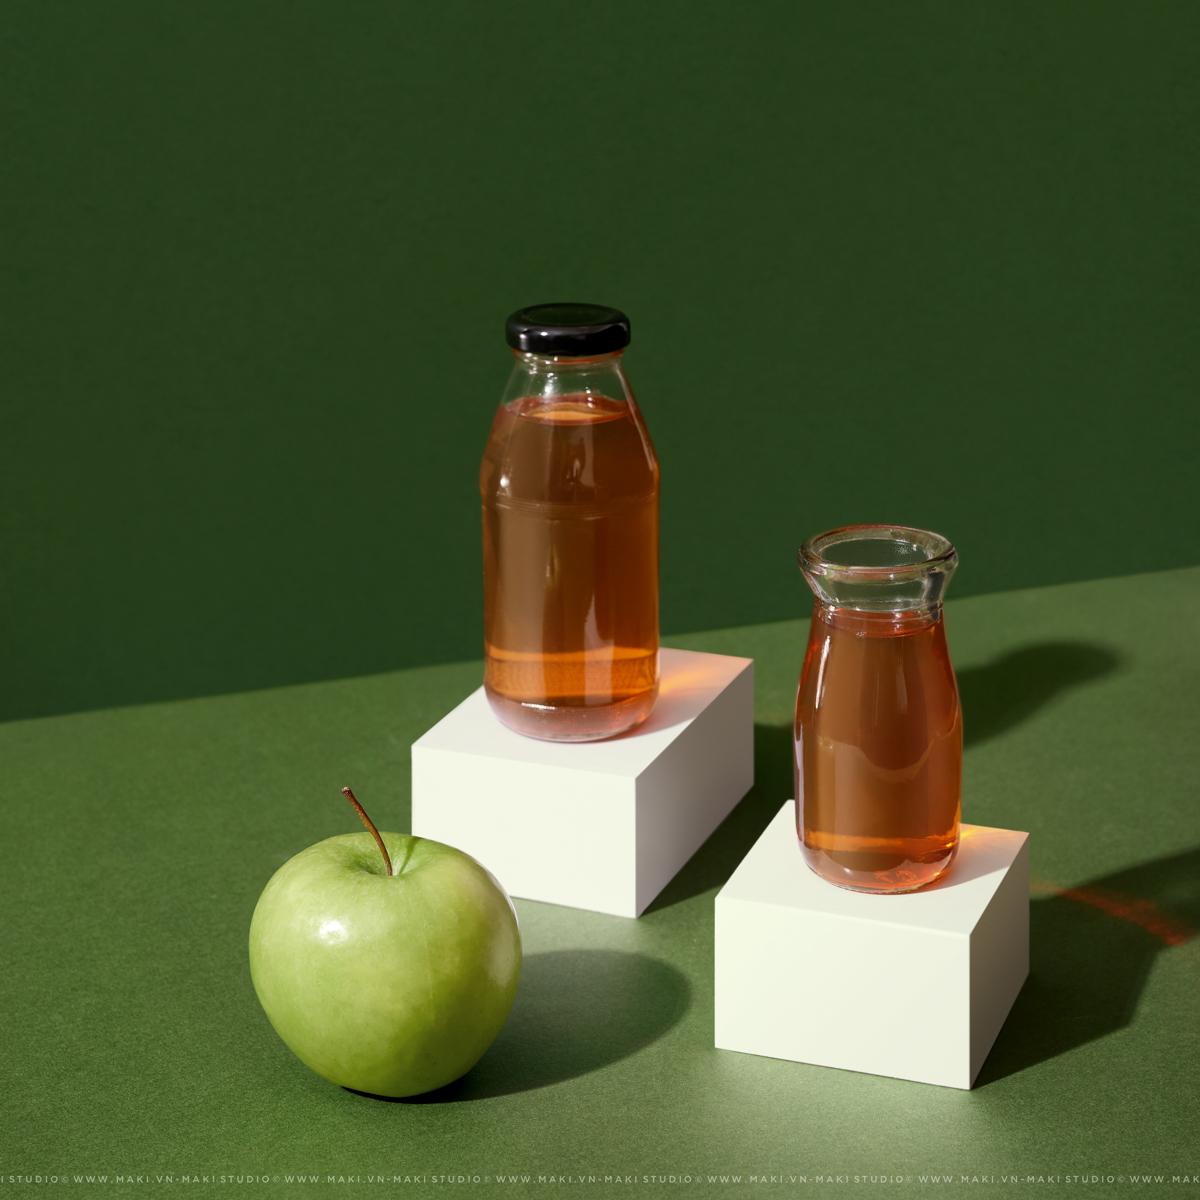 chup-anh-mon-an-summer-fruit-5.jpg